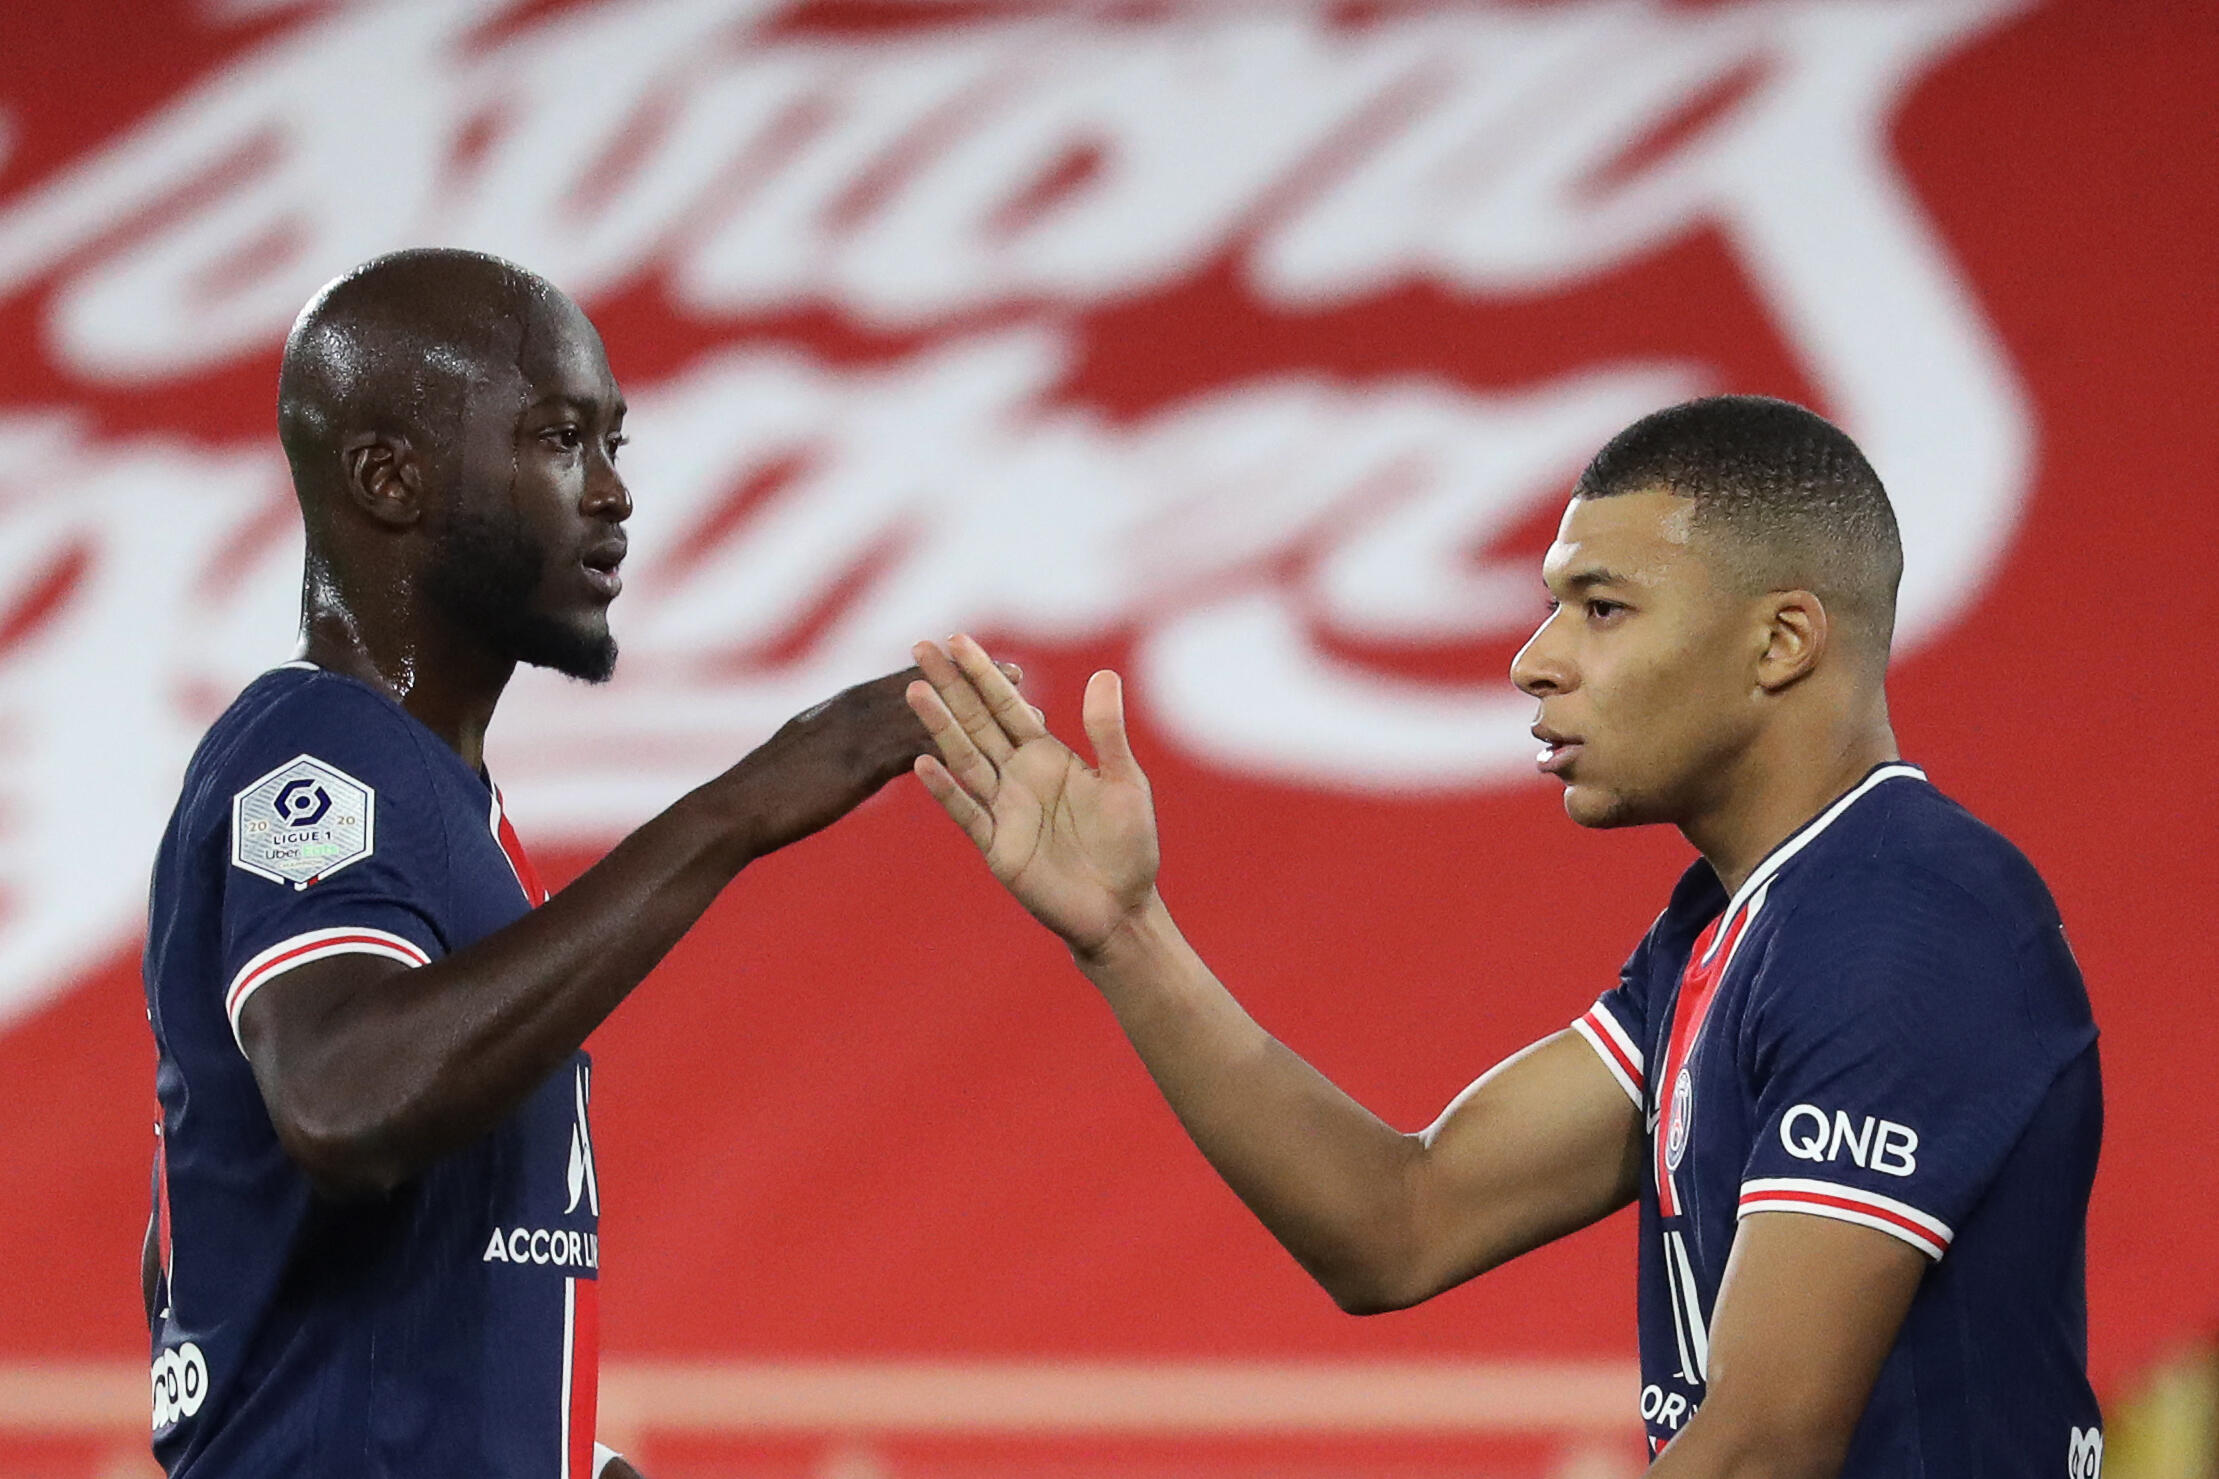 Danilo Pereira - FC Porto - Futebol - PSG - Paris Saint-Germain - Futebol - Football - Portugal - Ligue 1 - Kylian Mbappé